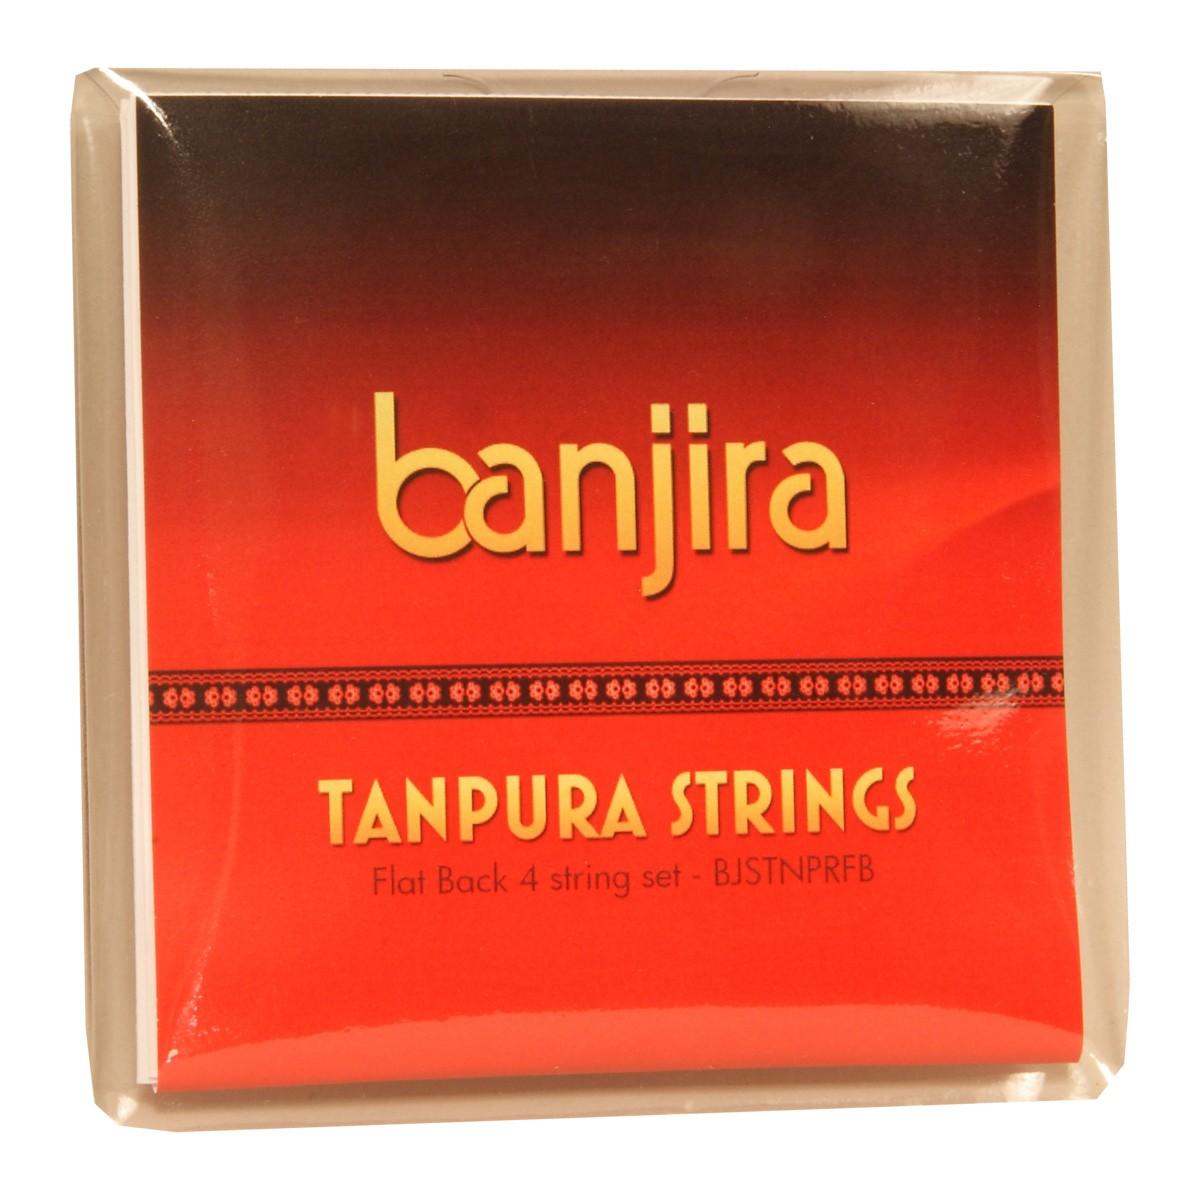 banjira Flat Back Tanpura String Set